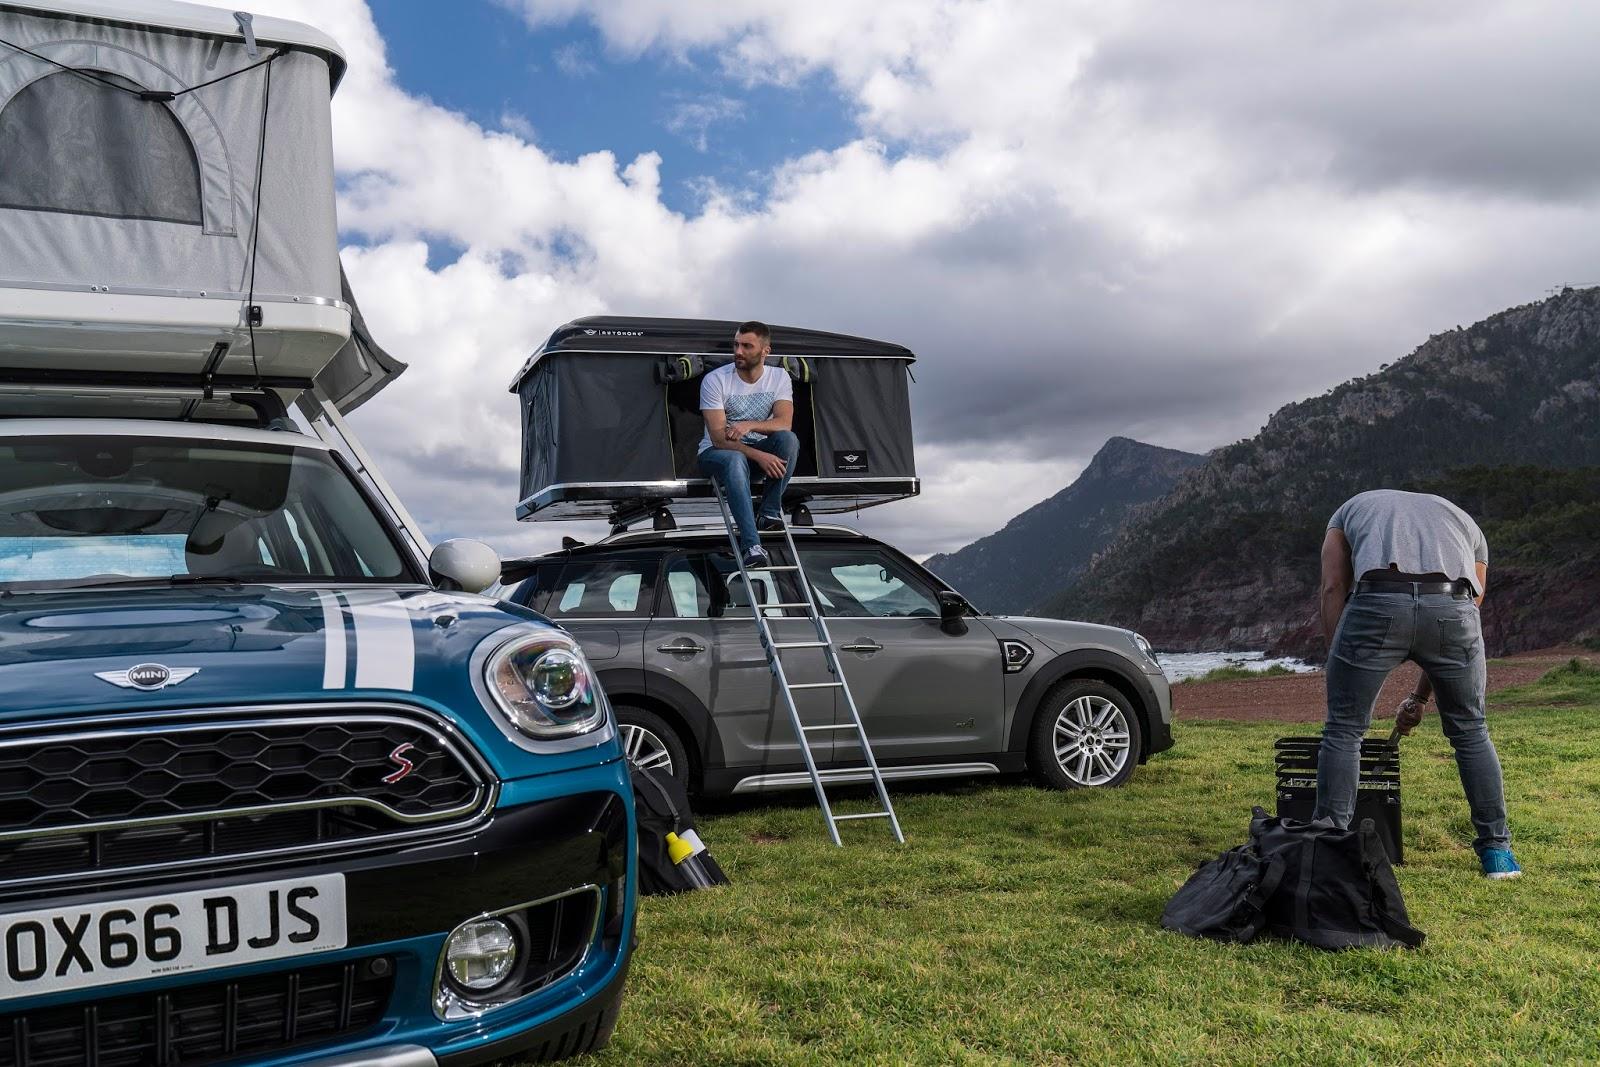 P90258008 highRes the autohome roof te Το MINI Countryman έχει και... σκηνή οροφής Mini, MINI Cooper Countryman, SUV